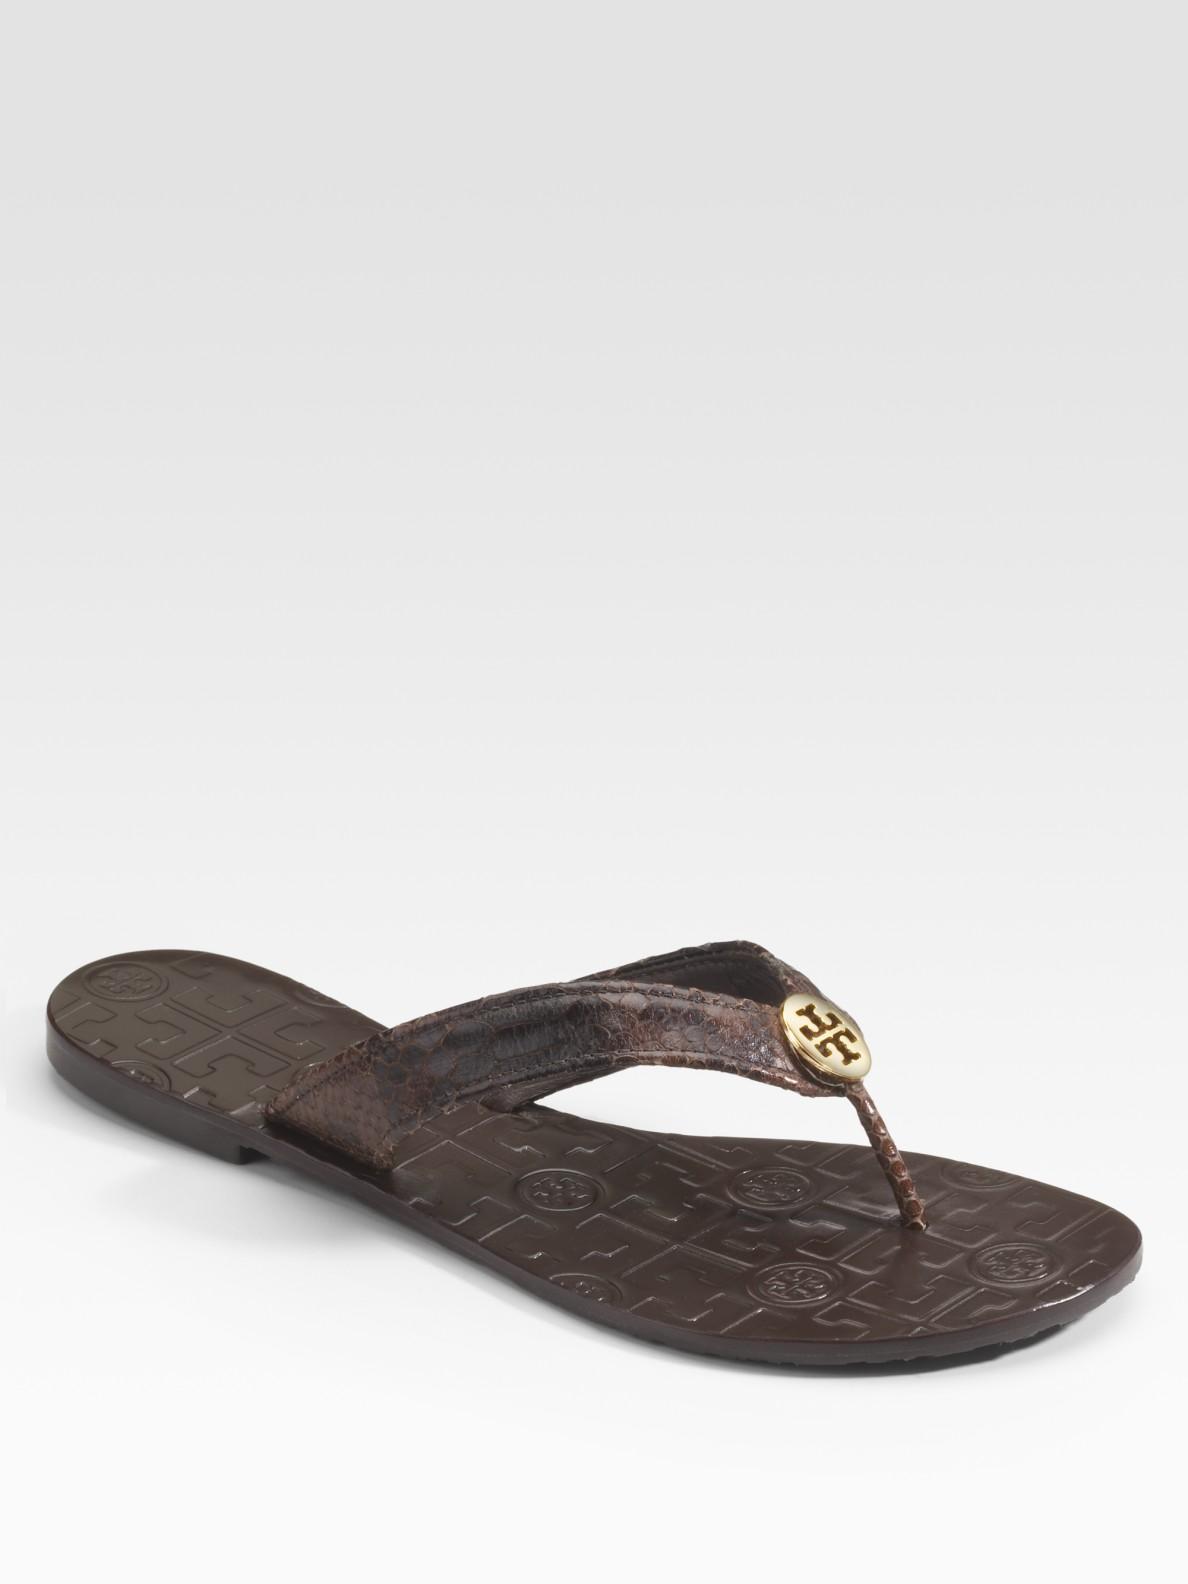 784403b7019b1 Lyst - Tory Burch Thora Snake-printed Leather Flip Flops in Brown